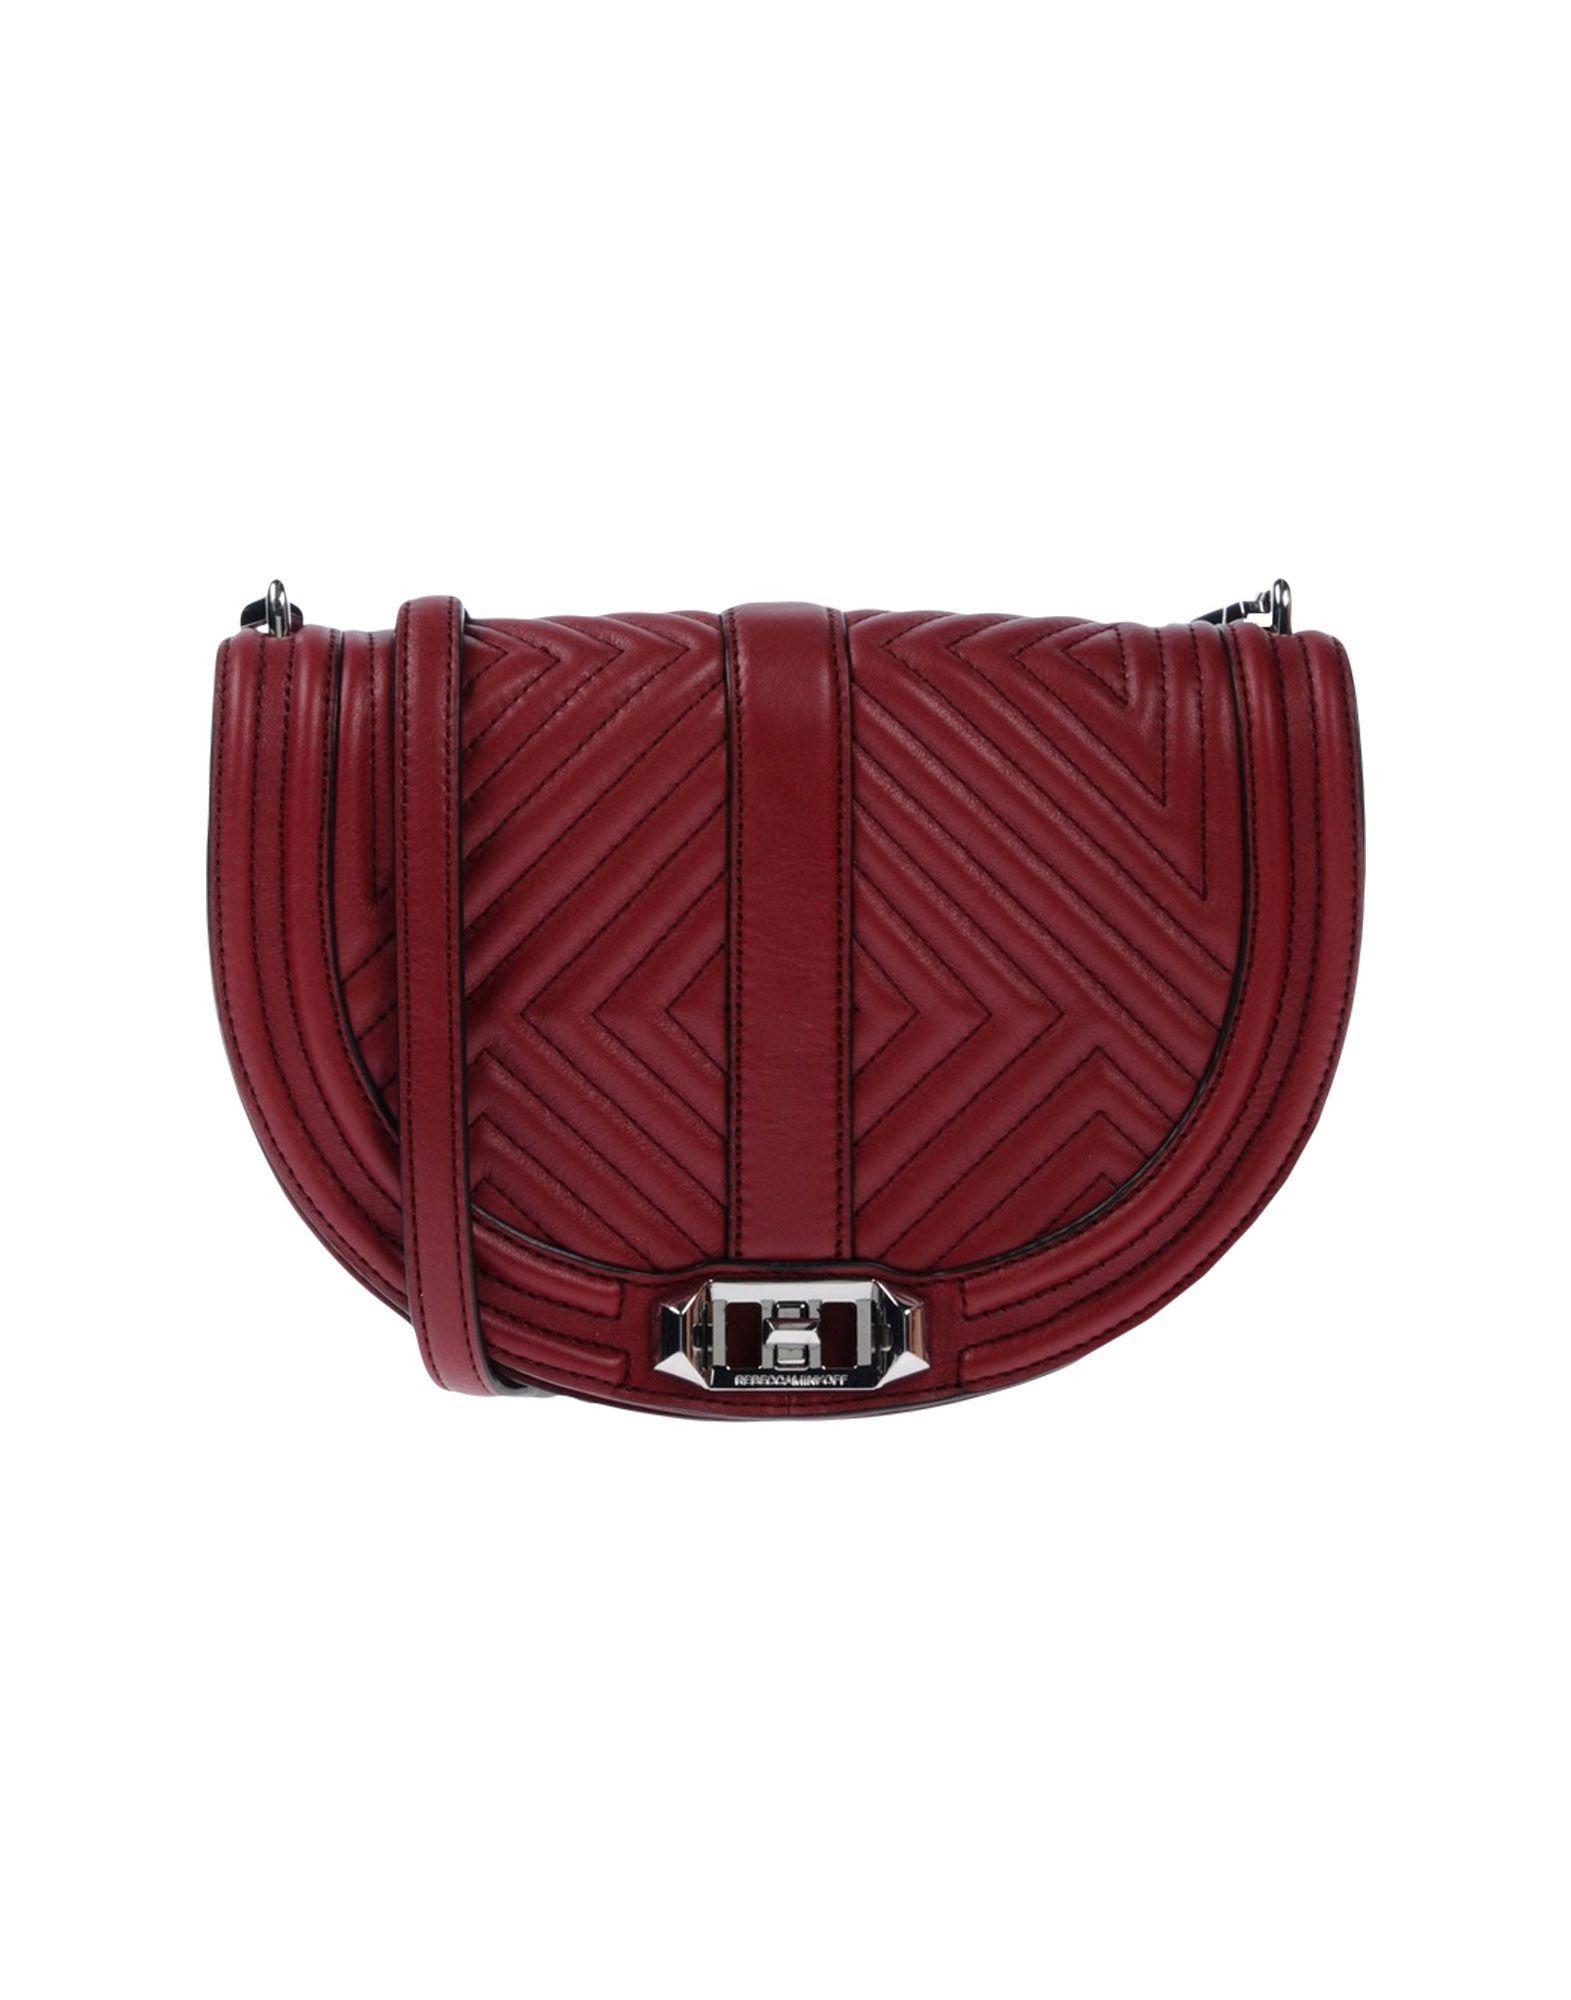 Rebecca Minkoff Handbags In Maroon